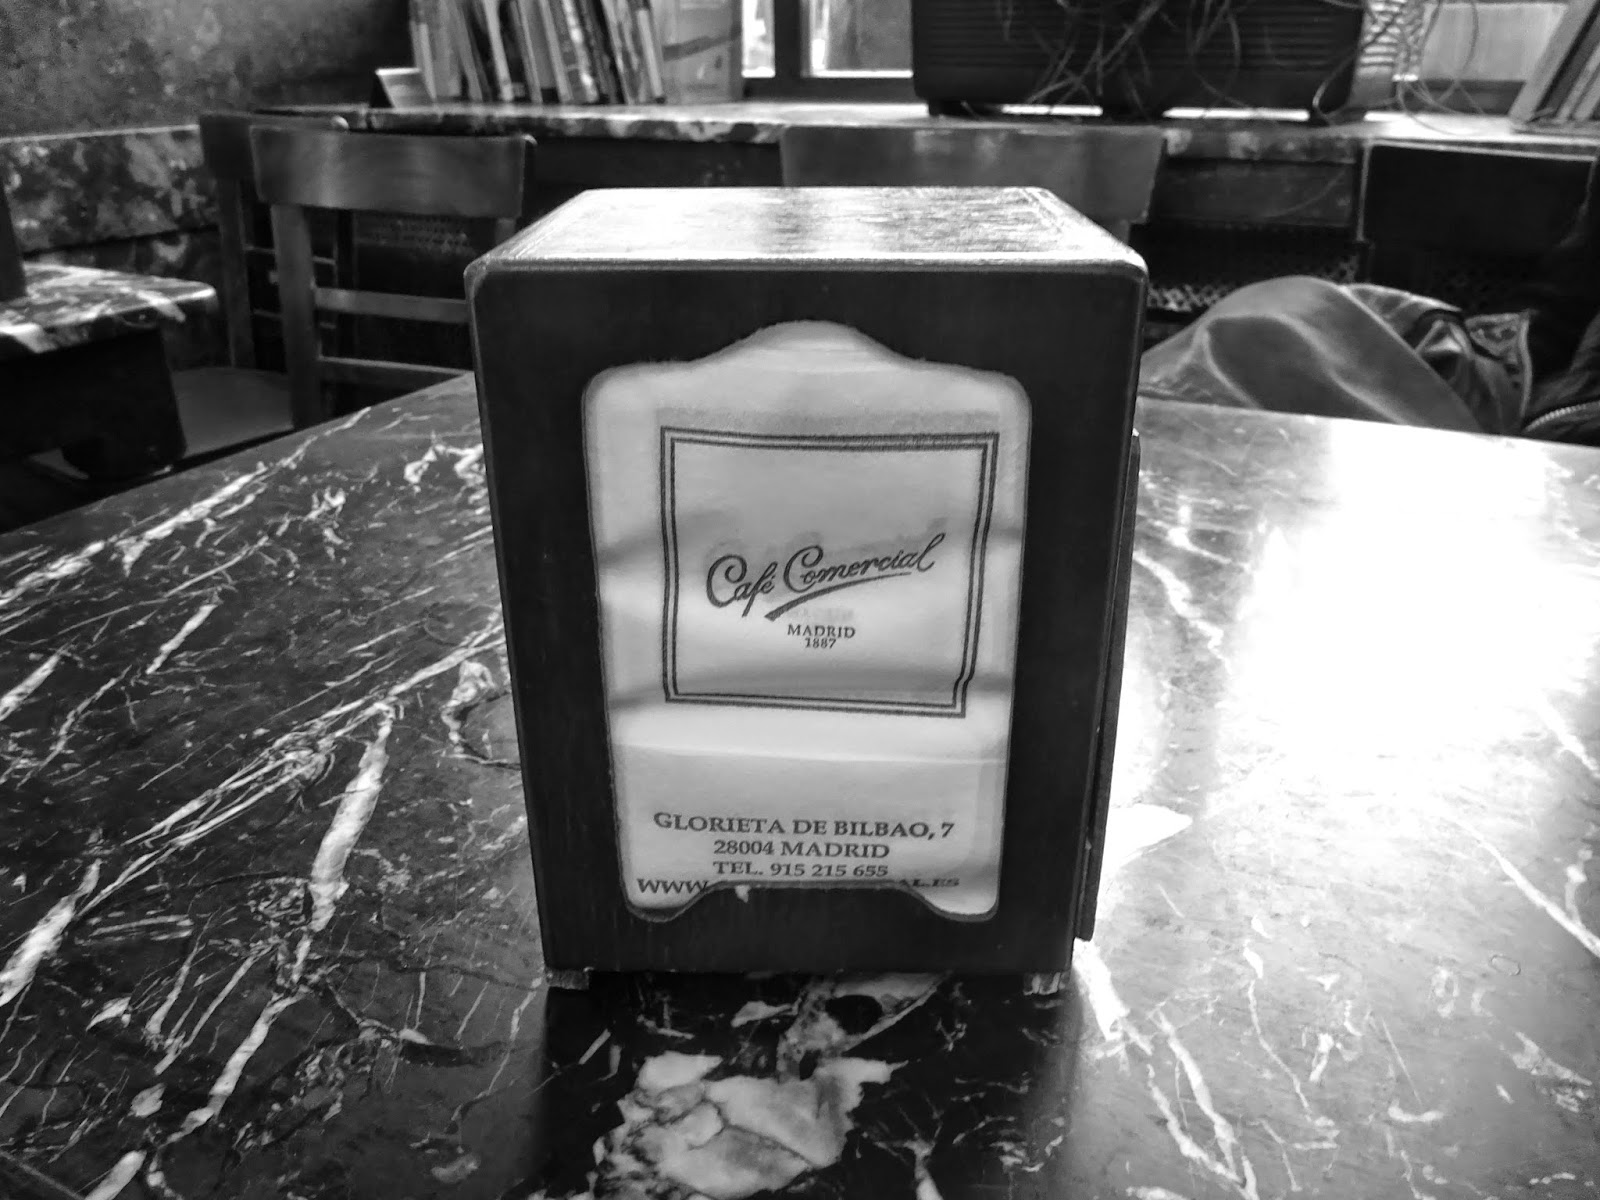 cafe comercial cafeteria antigua bar madrid glorieta bilbao fuencarral sagasta carranza